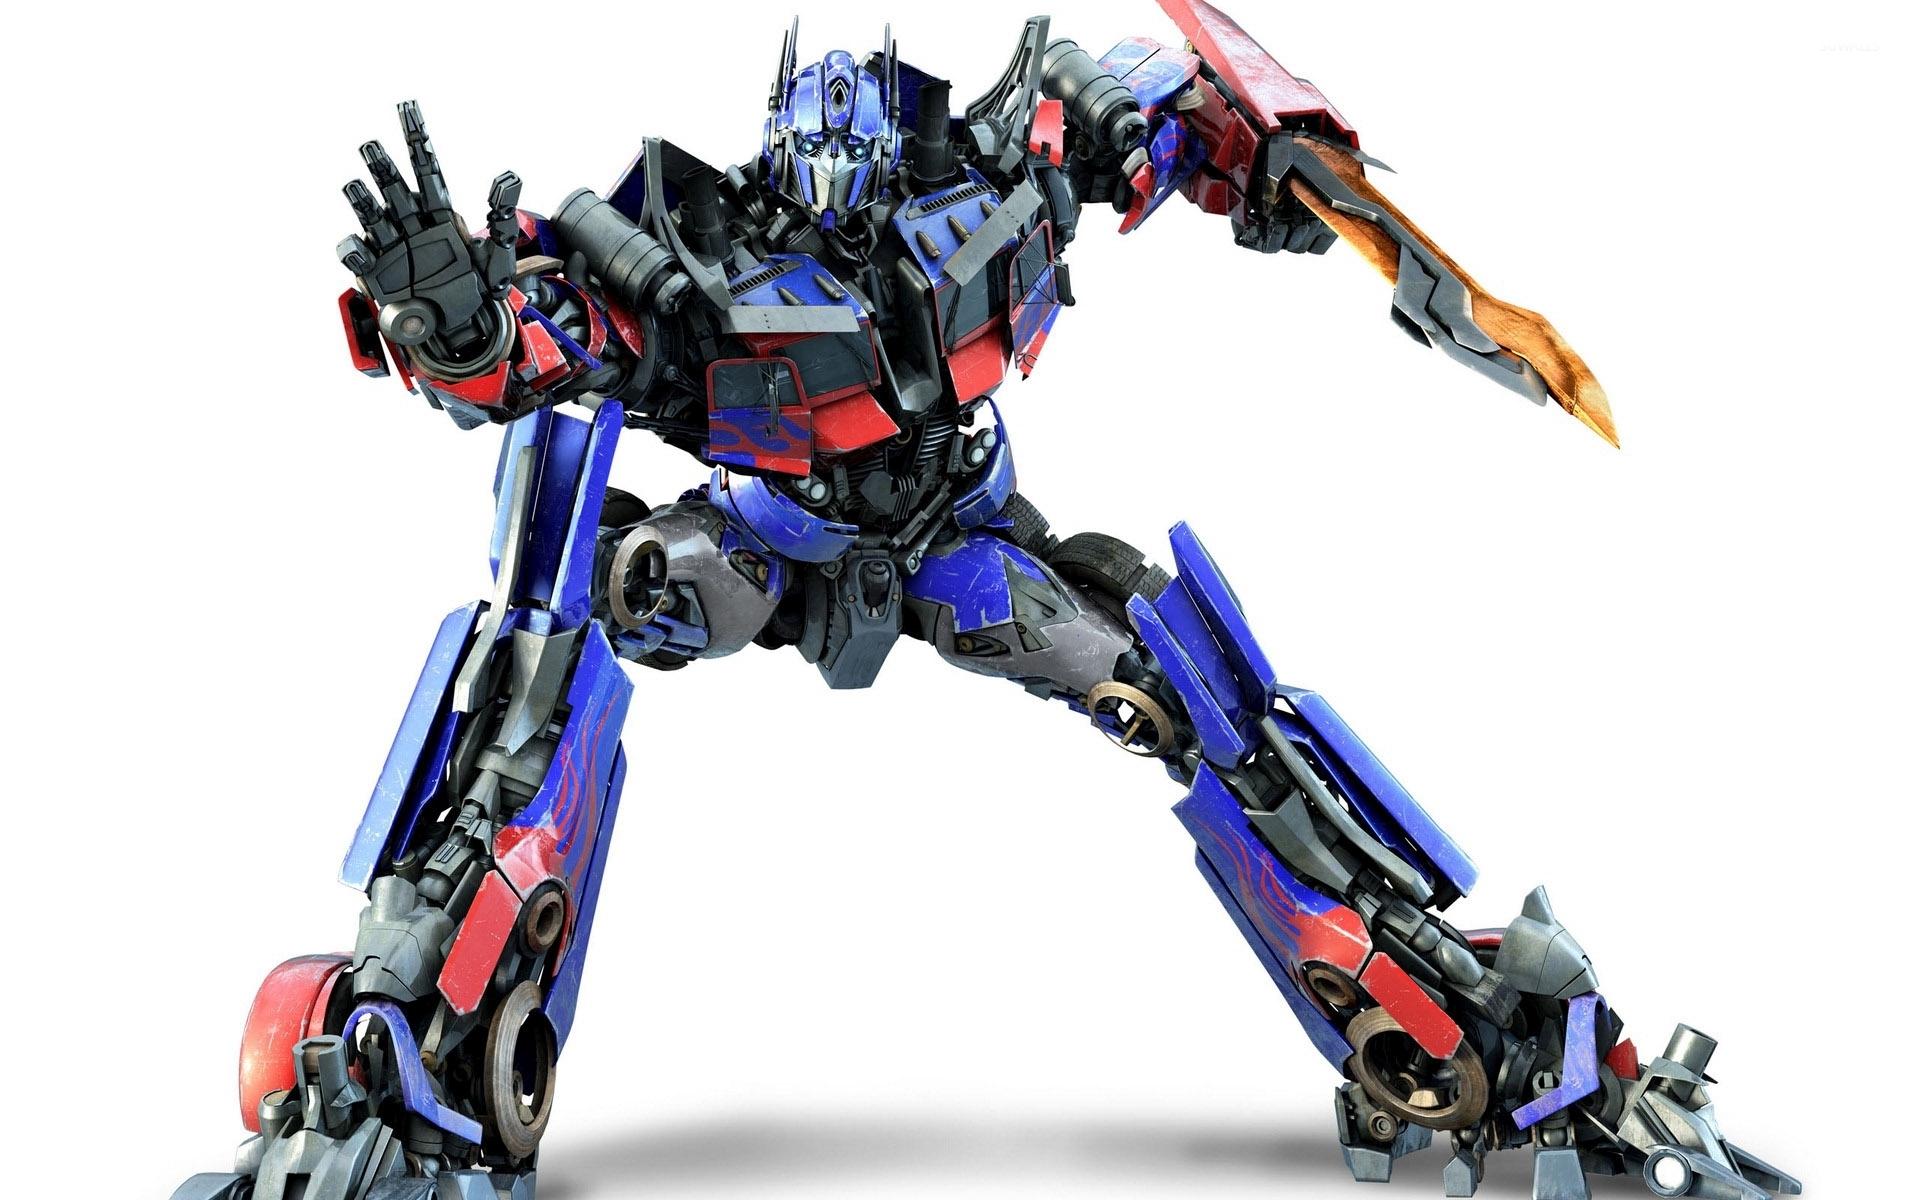 optimus prime transformers - photo #35